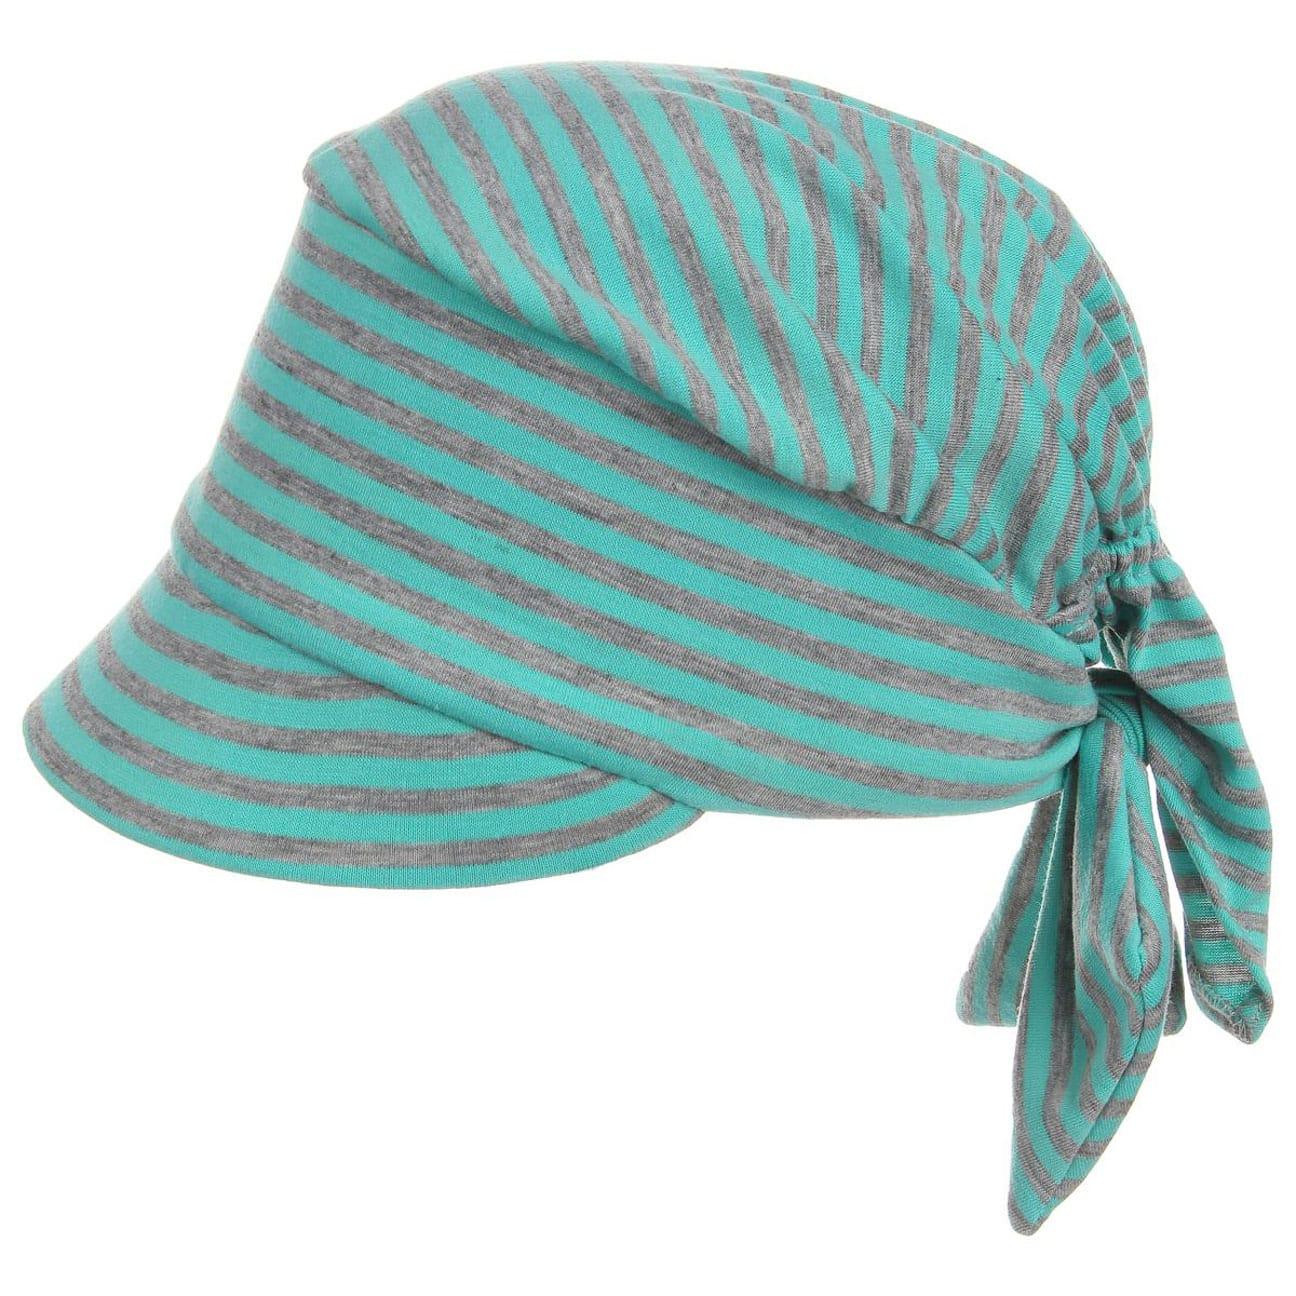 Lucia Bandana Cap Eur 24 95 Gt Hats Caps Amp Beanies Shop